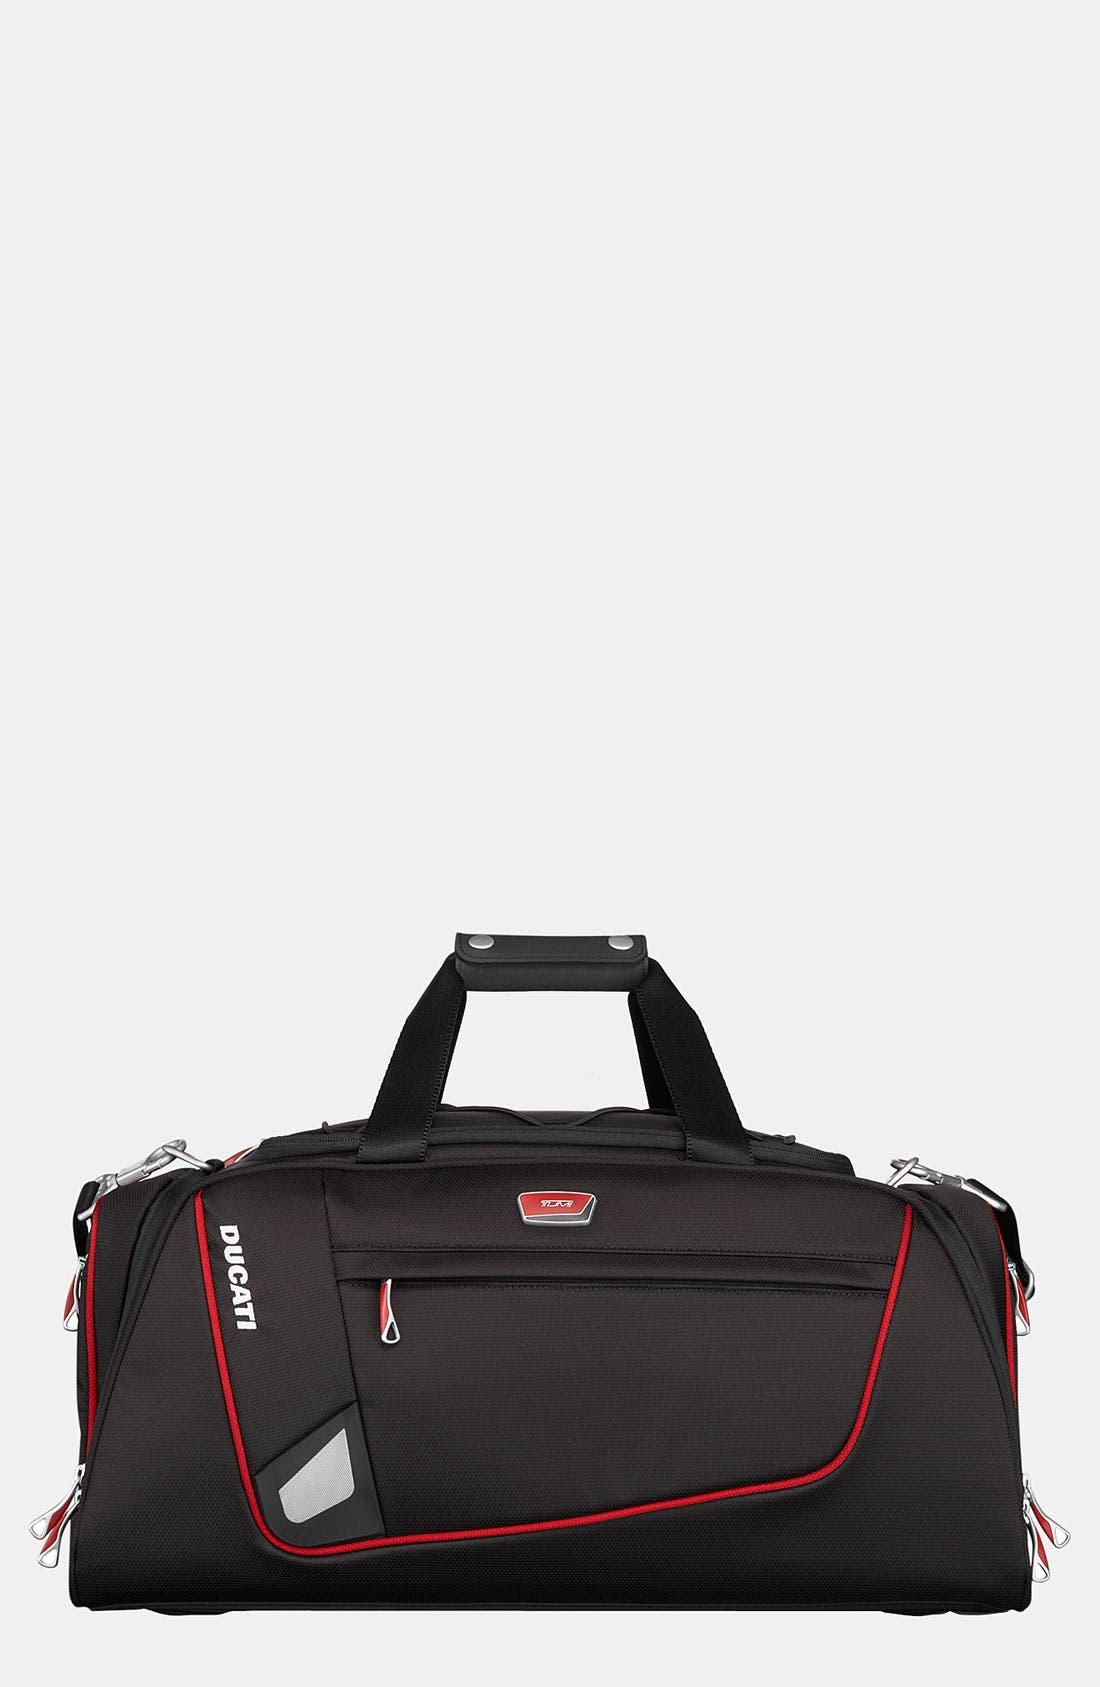 Main Image - Tumi 'Ducati - Actuator' Sport Duffel Bag